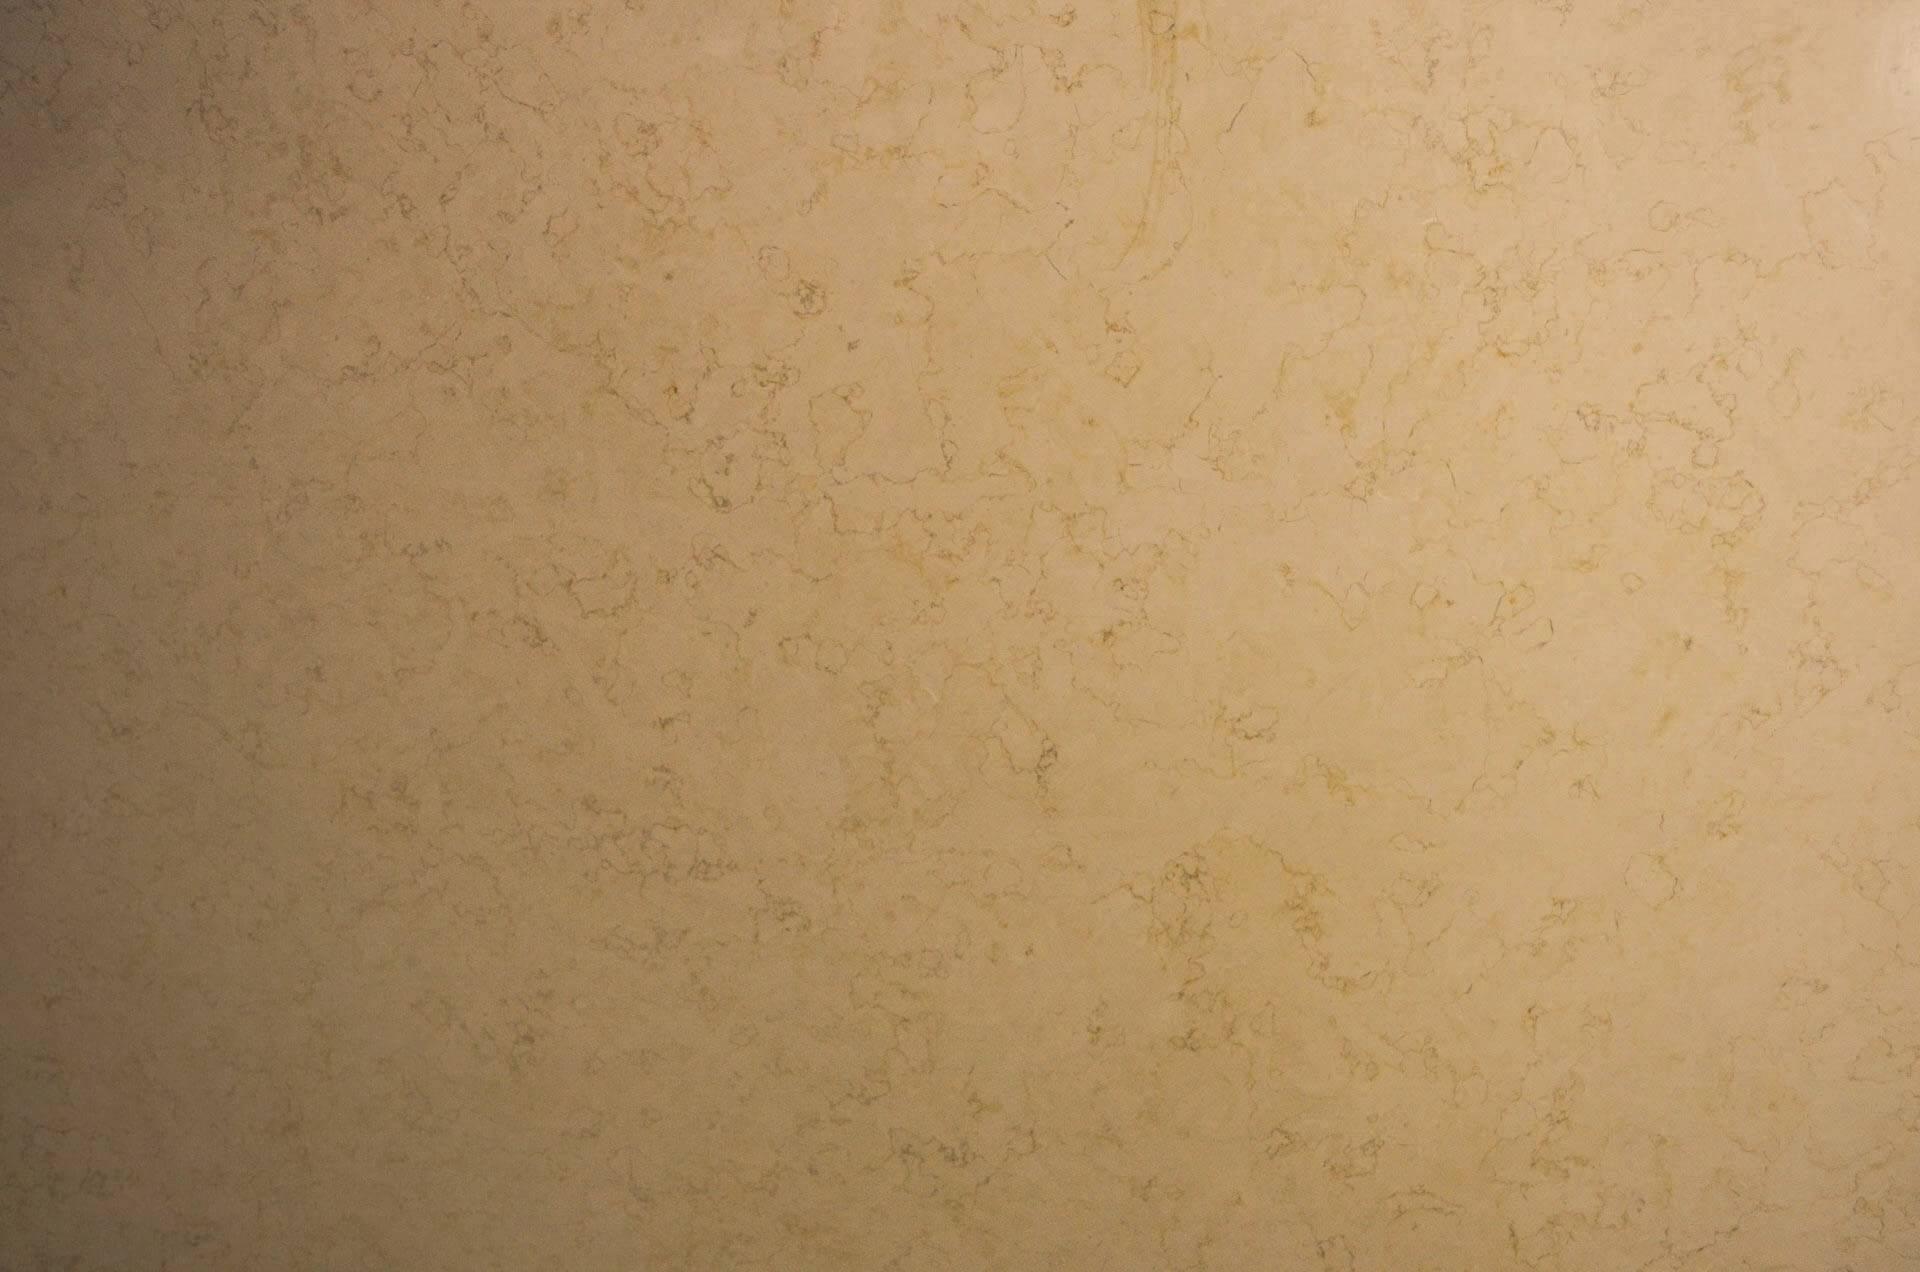 Golden Cream фото 1 — камень от Bevers Marmyr